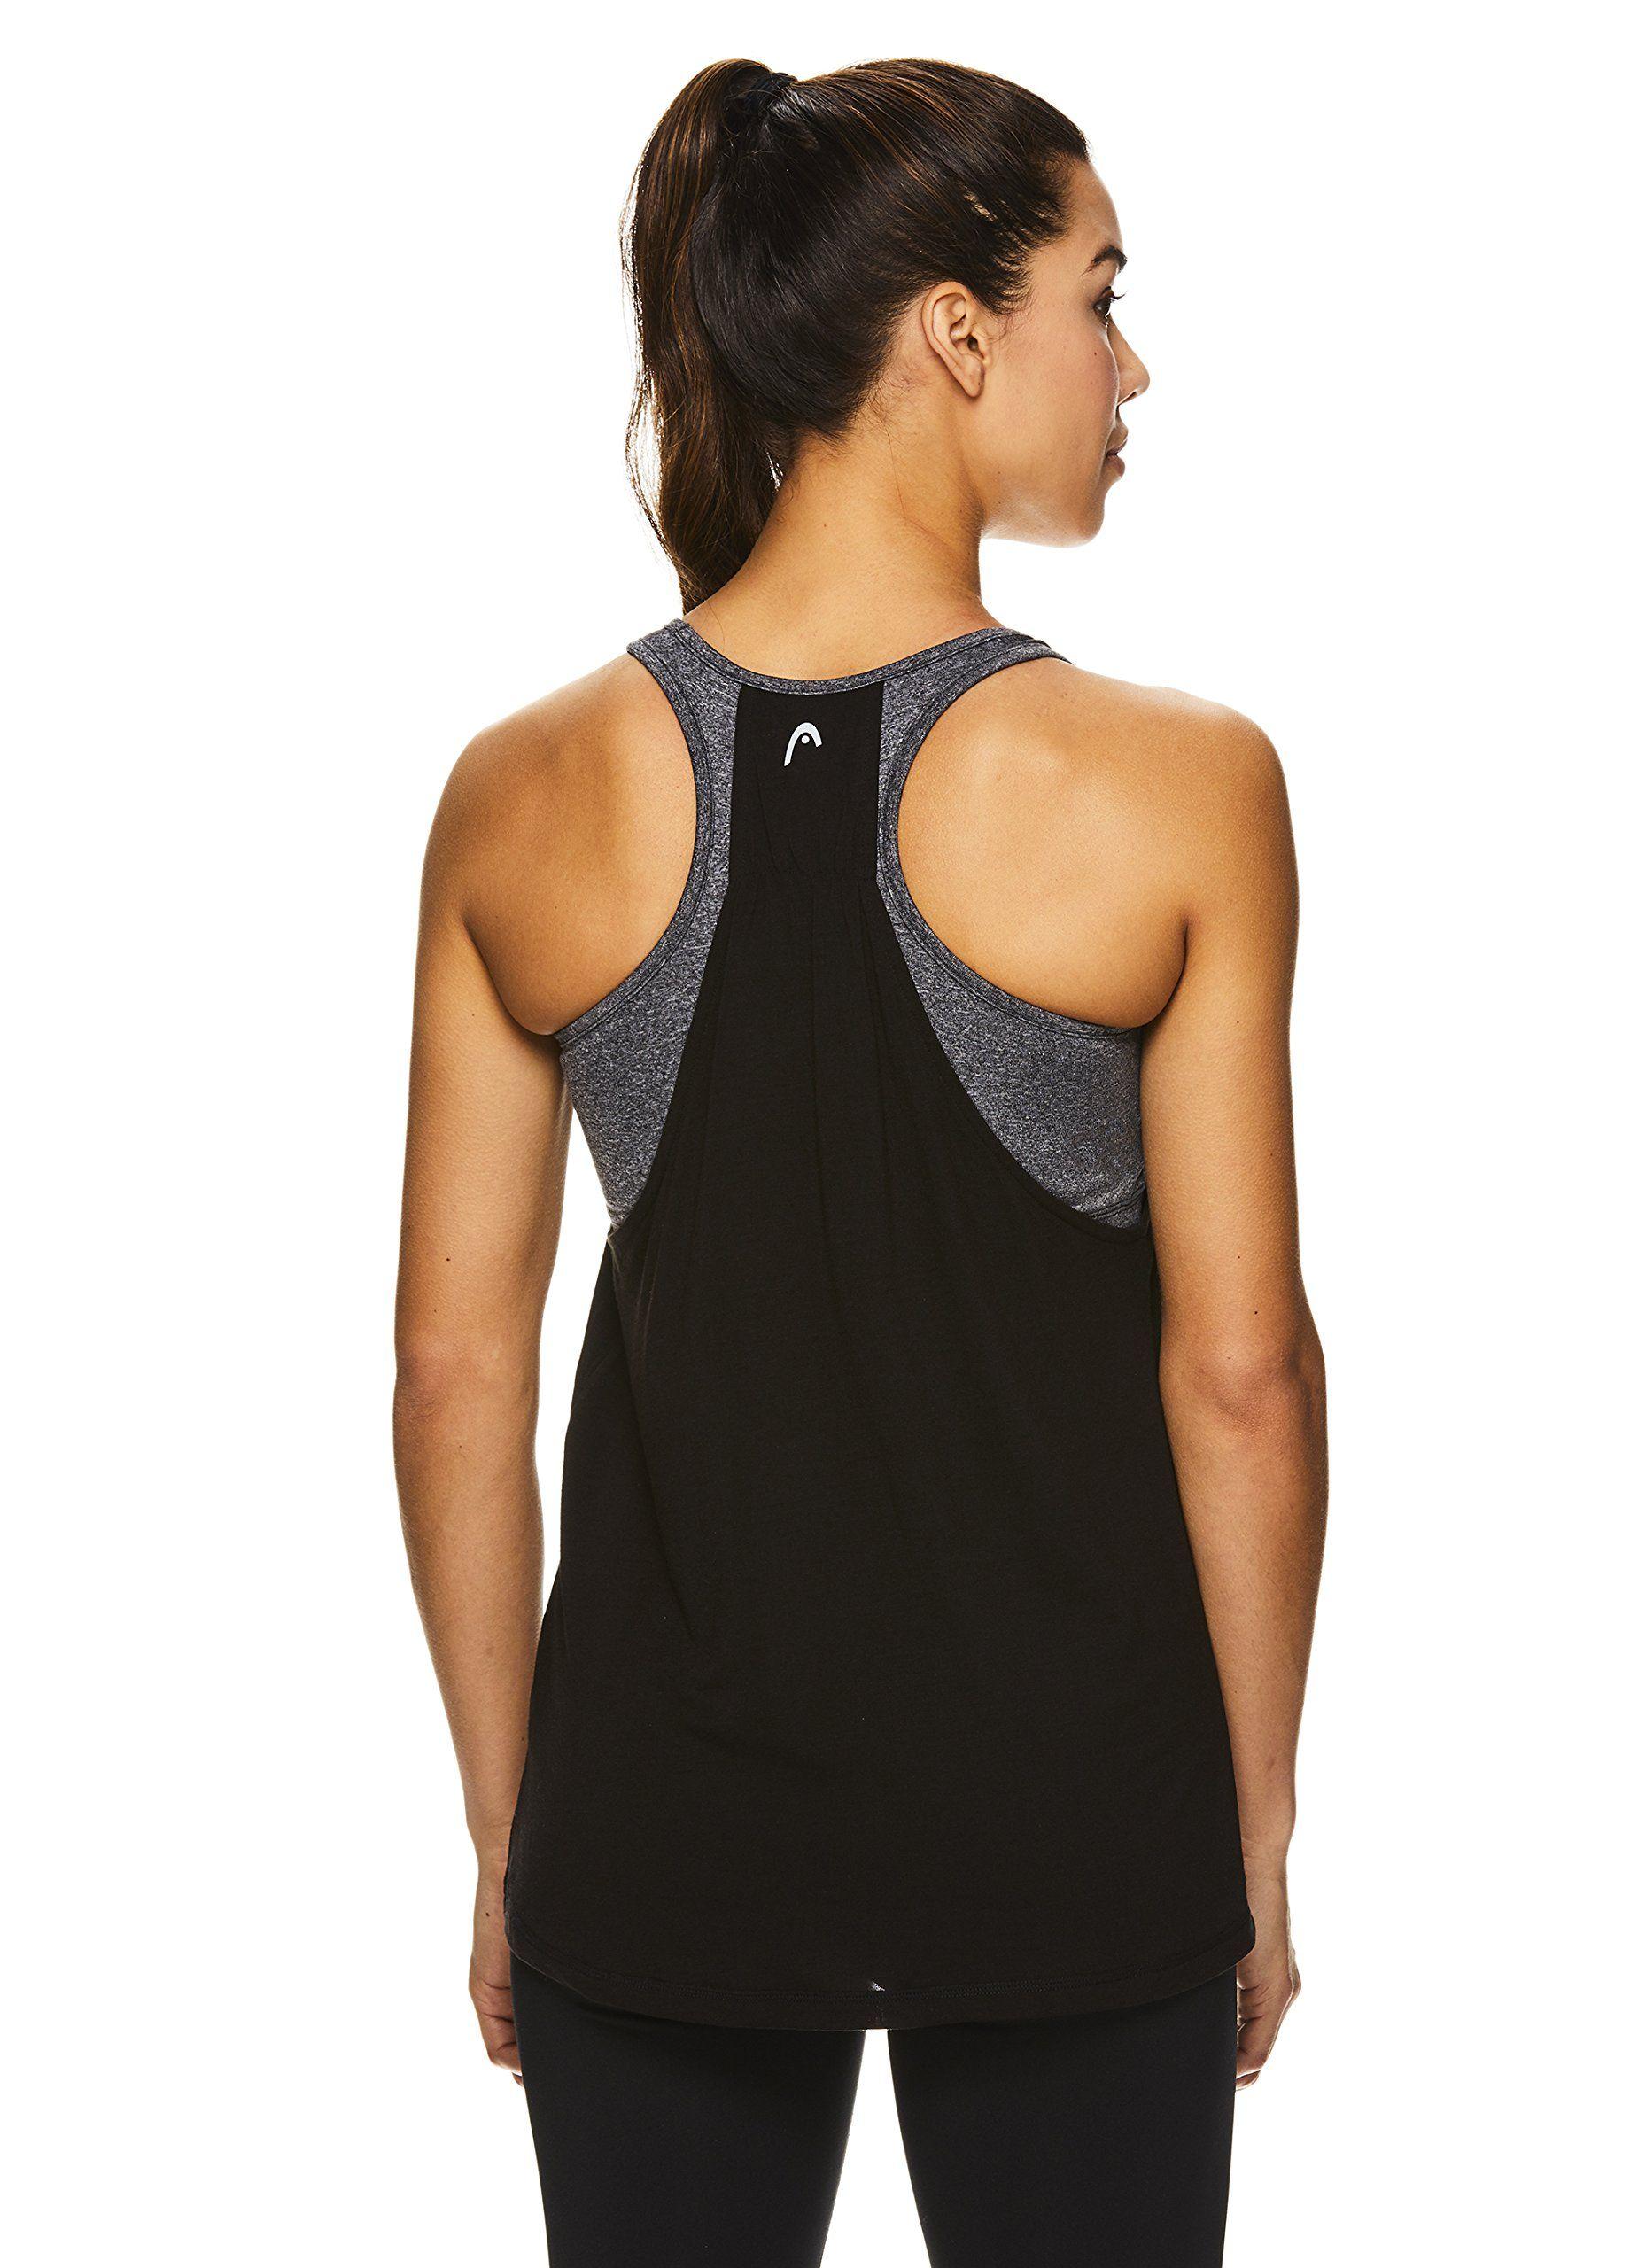 958c7e7976d pregnancy workout - HEAD Womens Contender Racerback Workout Tank Top w/Built  in Shelf Sports Bra Black Contender Medium -- Look into this wonderful item.